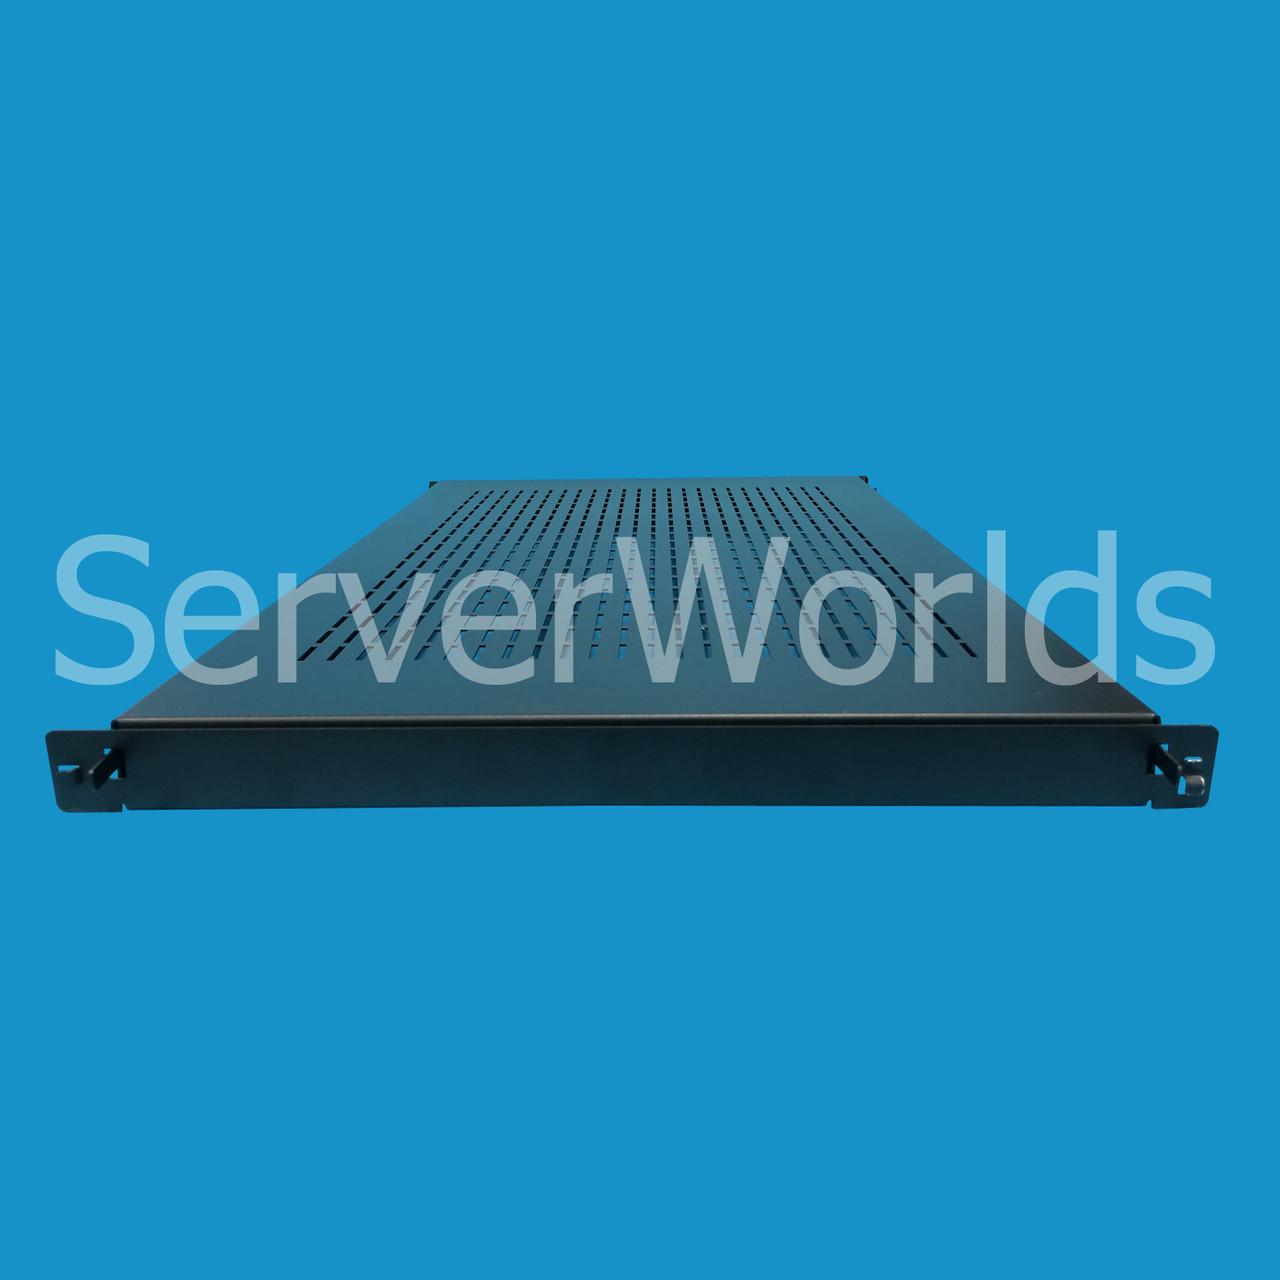 Dell 7163u Dell Fixed Shelf Serverworlds